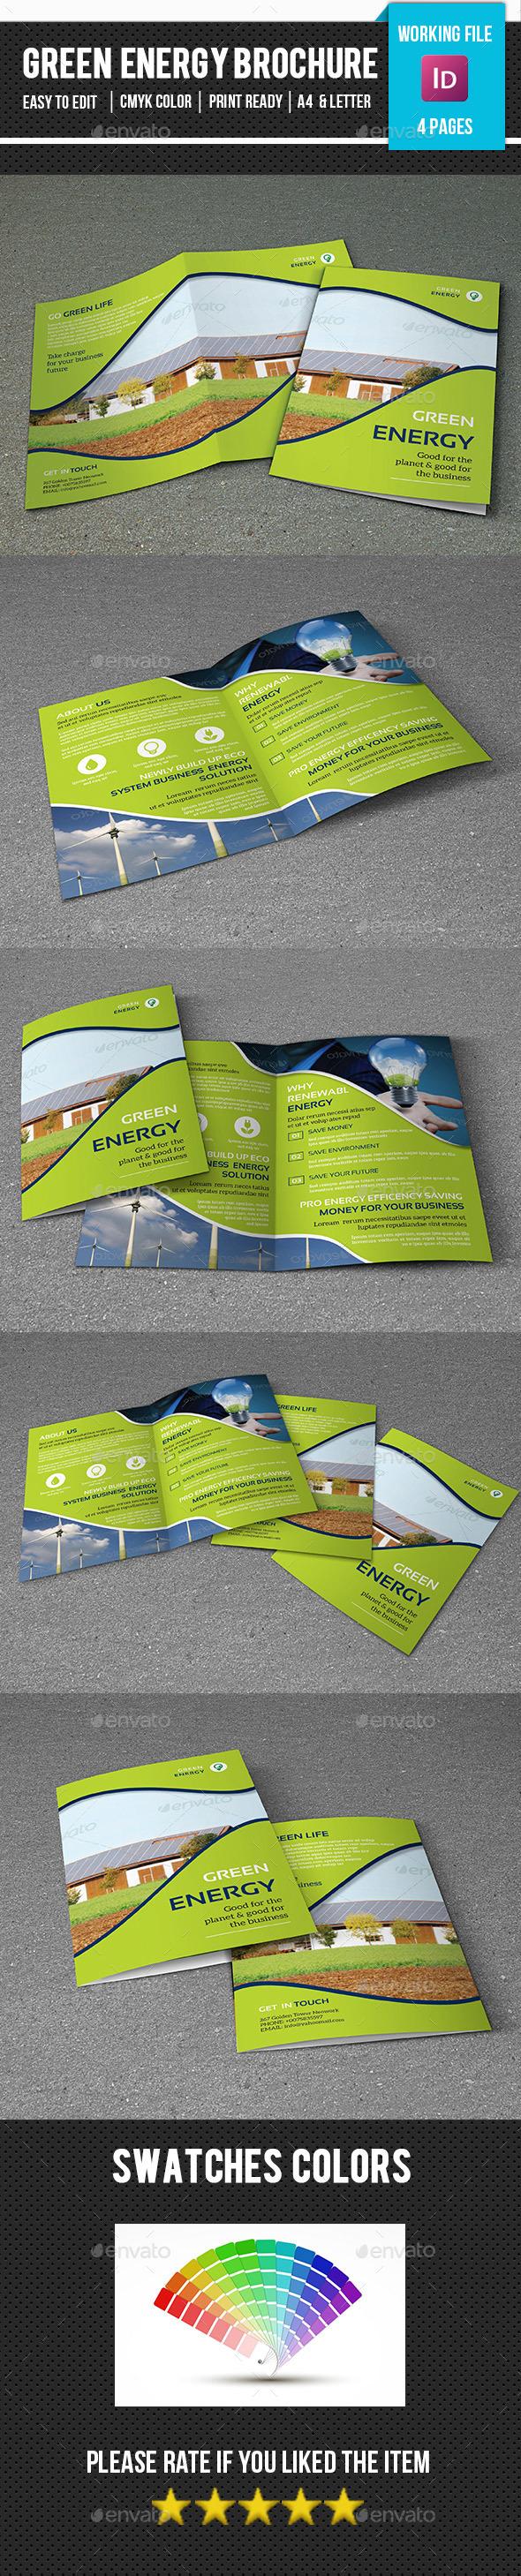 Green Energy Brochure-V357 - Corporate Brochures